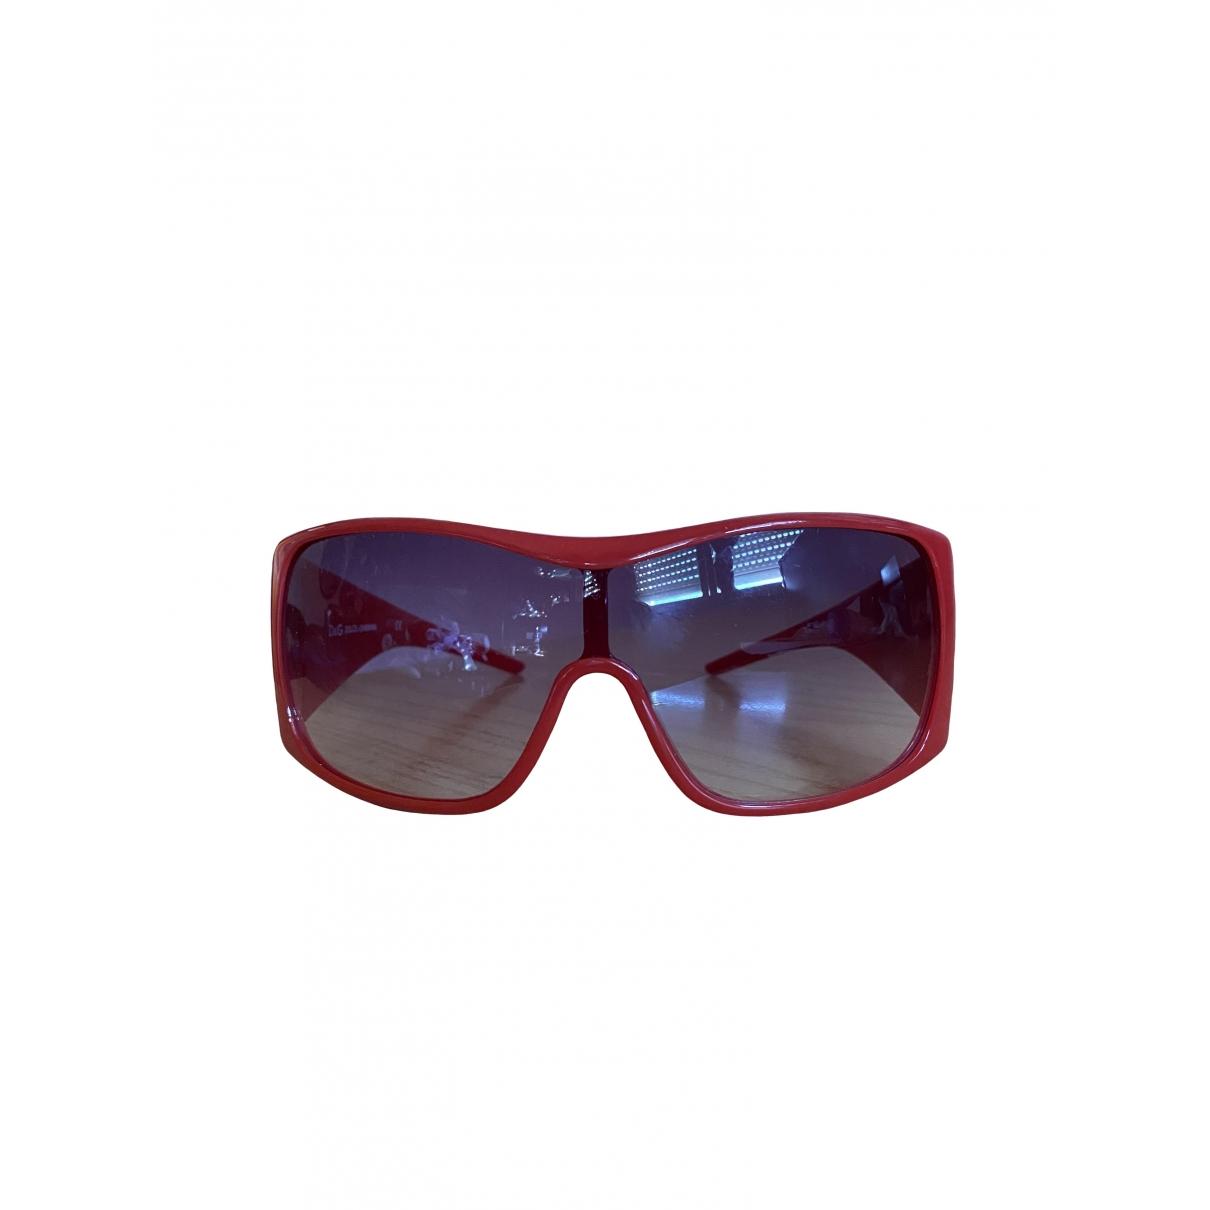 Gafas mascara D&g